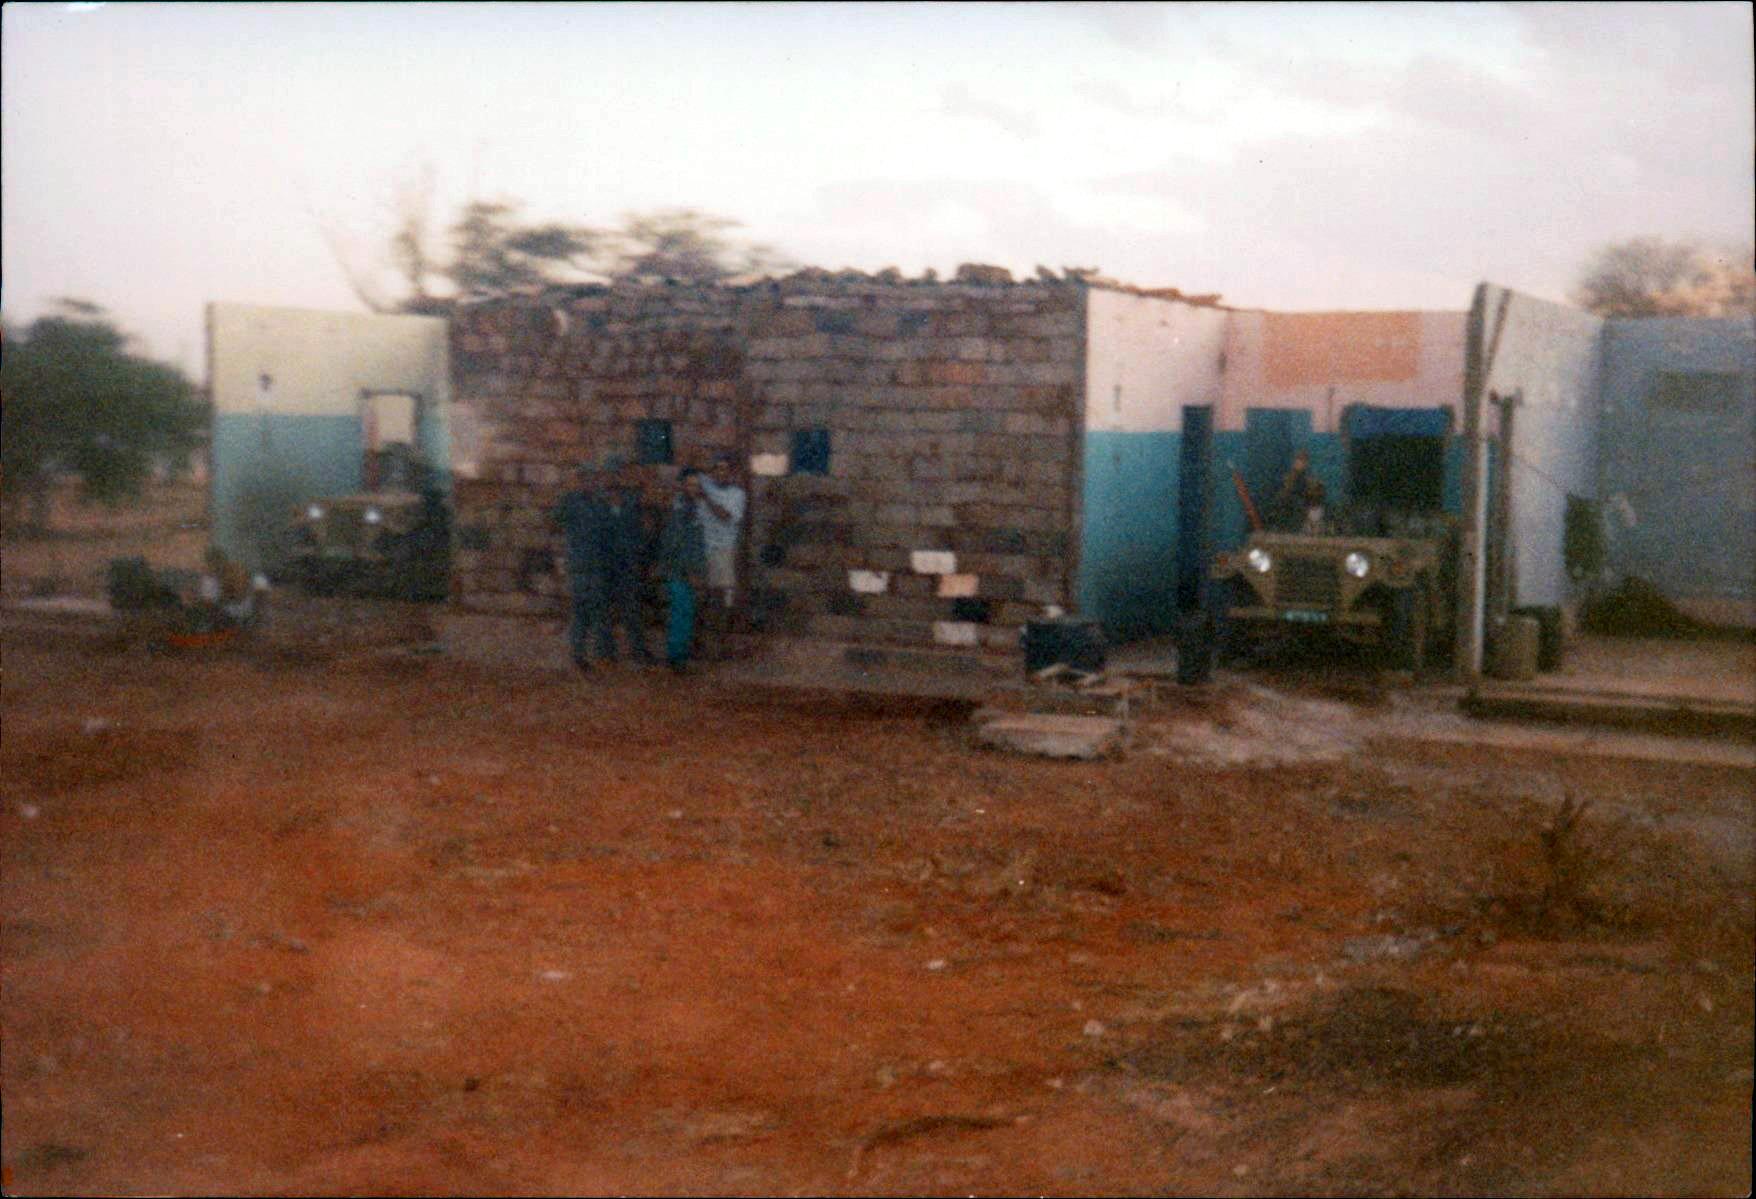 Les FAR en Somalie - Page 2 30410